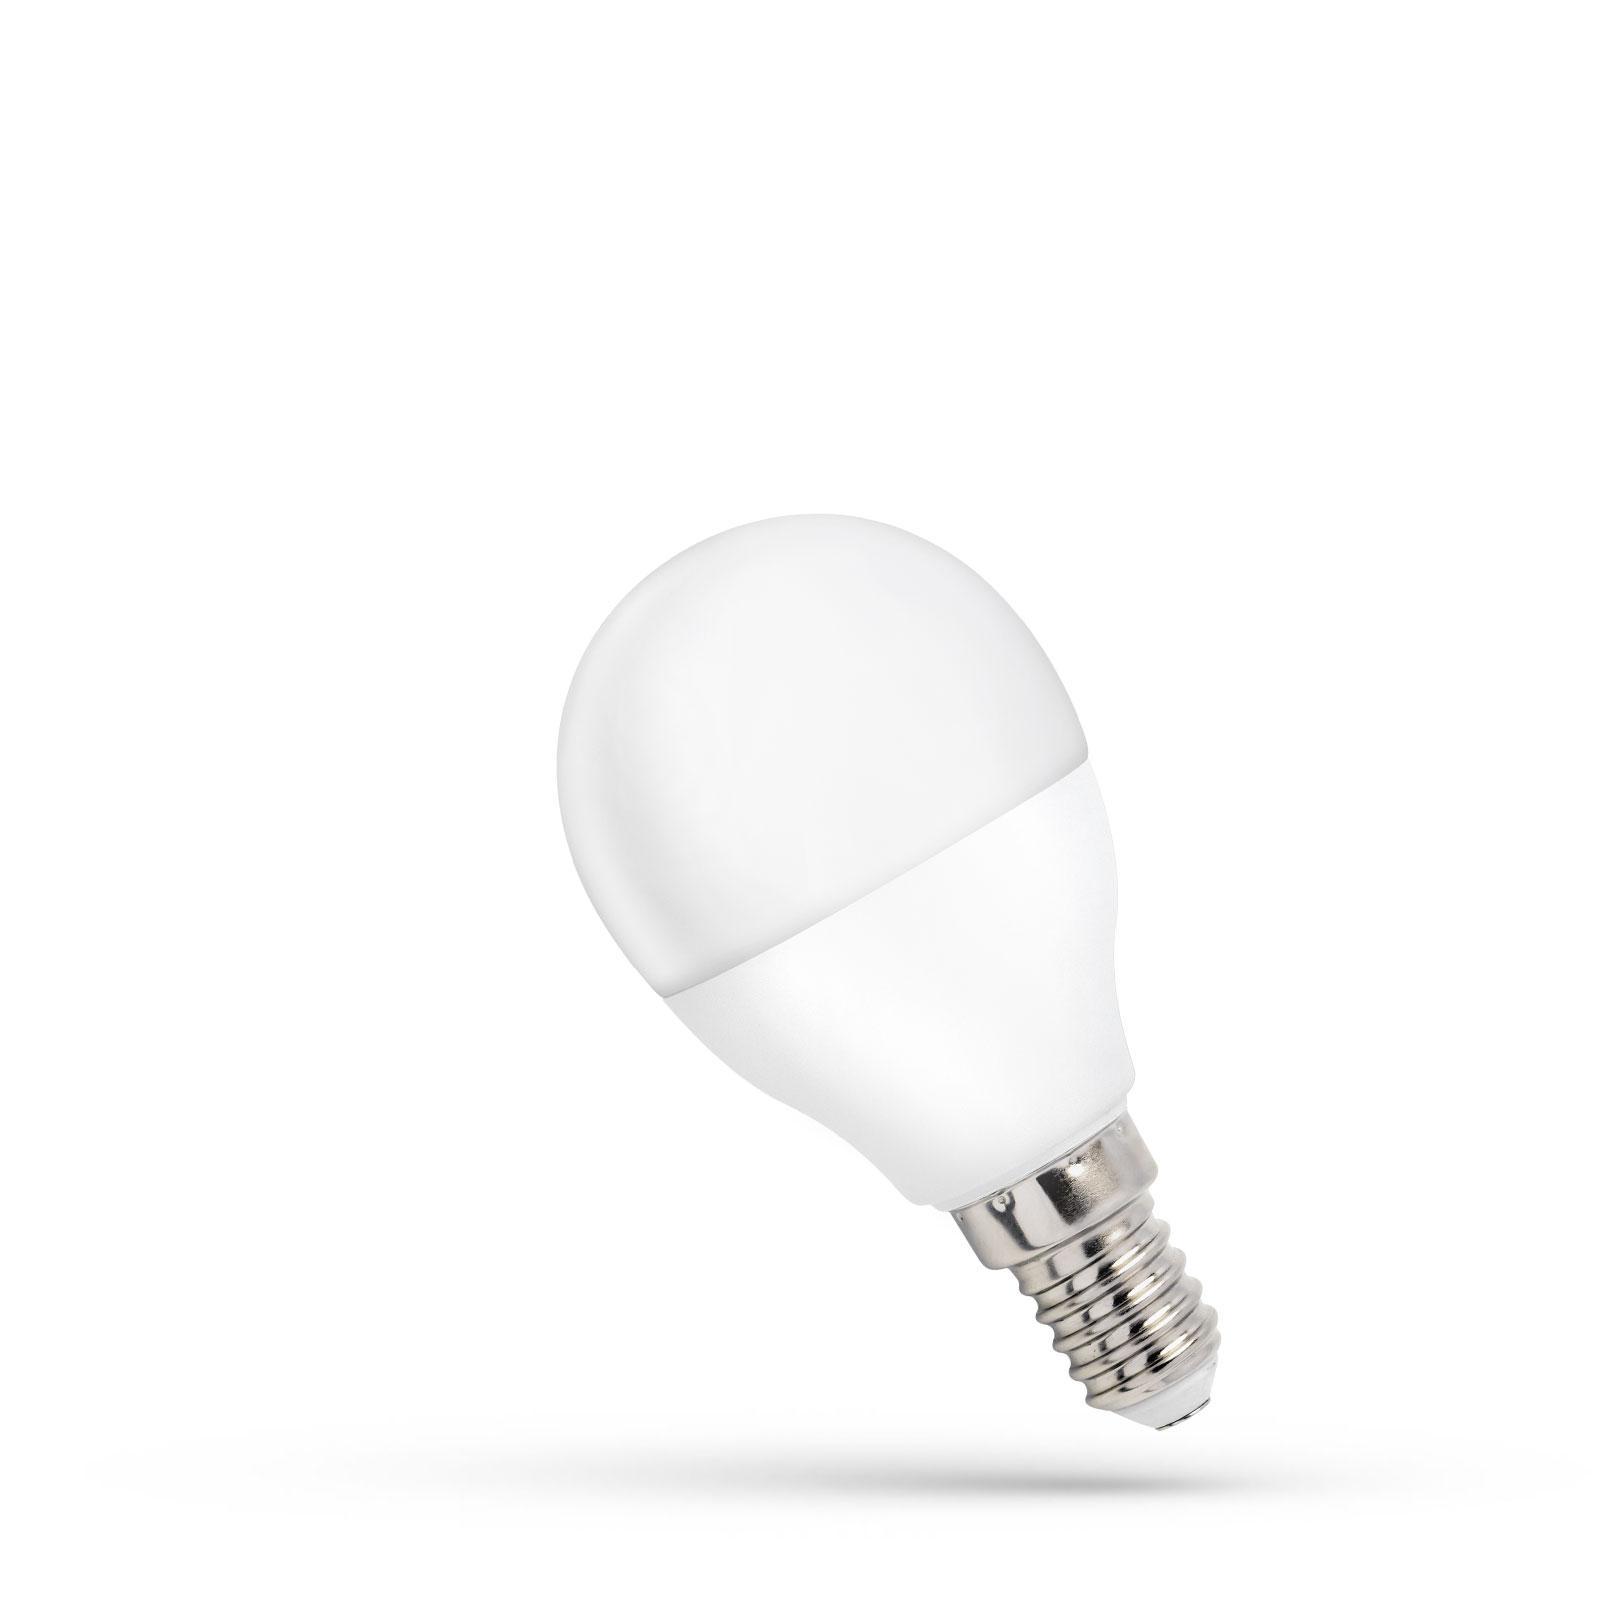 LED žárovka  E14 8W 620lm G45 teplá,  ekvivalent 60W